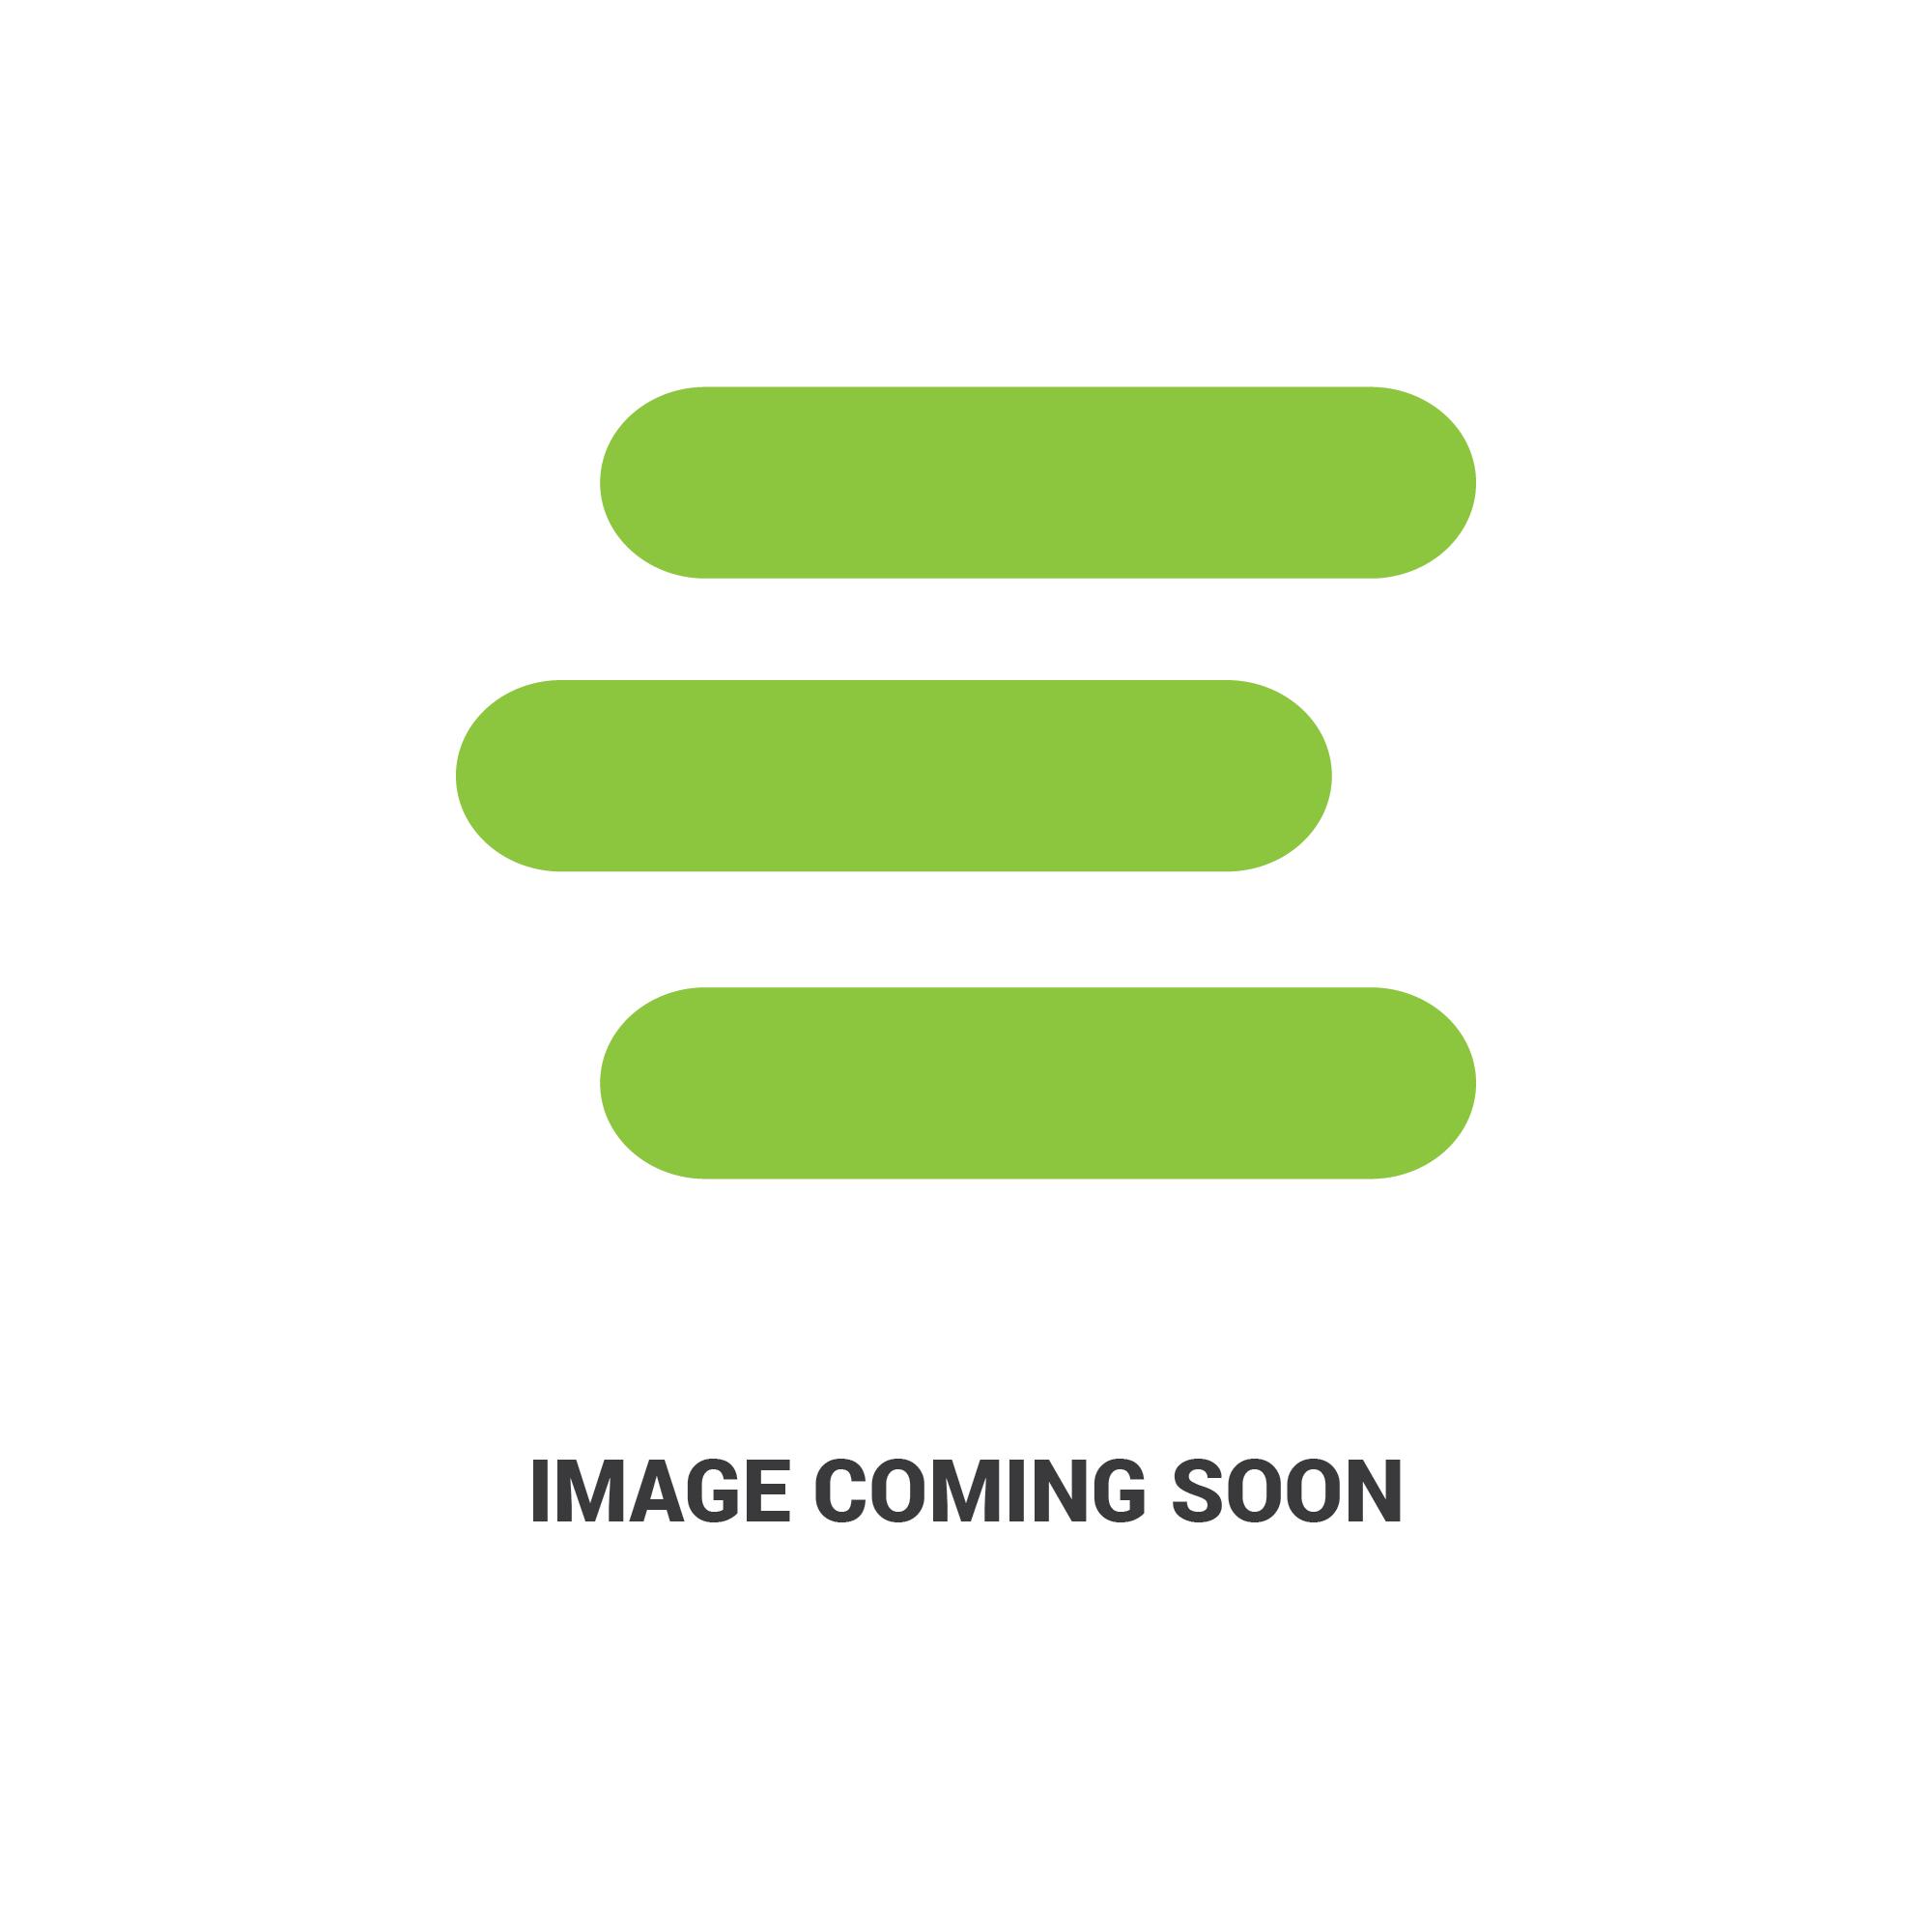 E-6632388edit 17.jpg